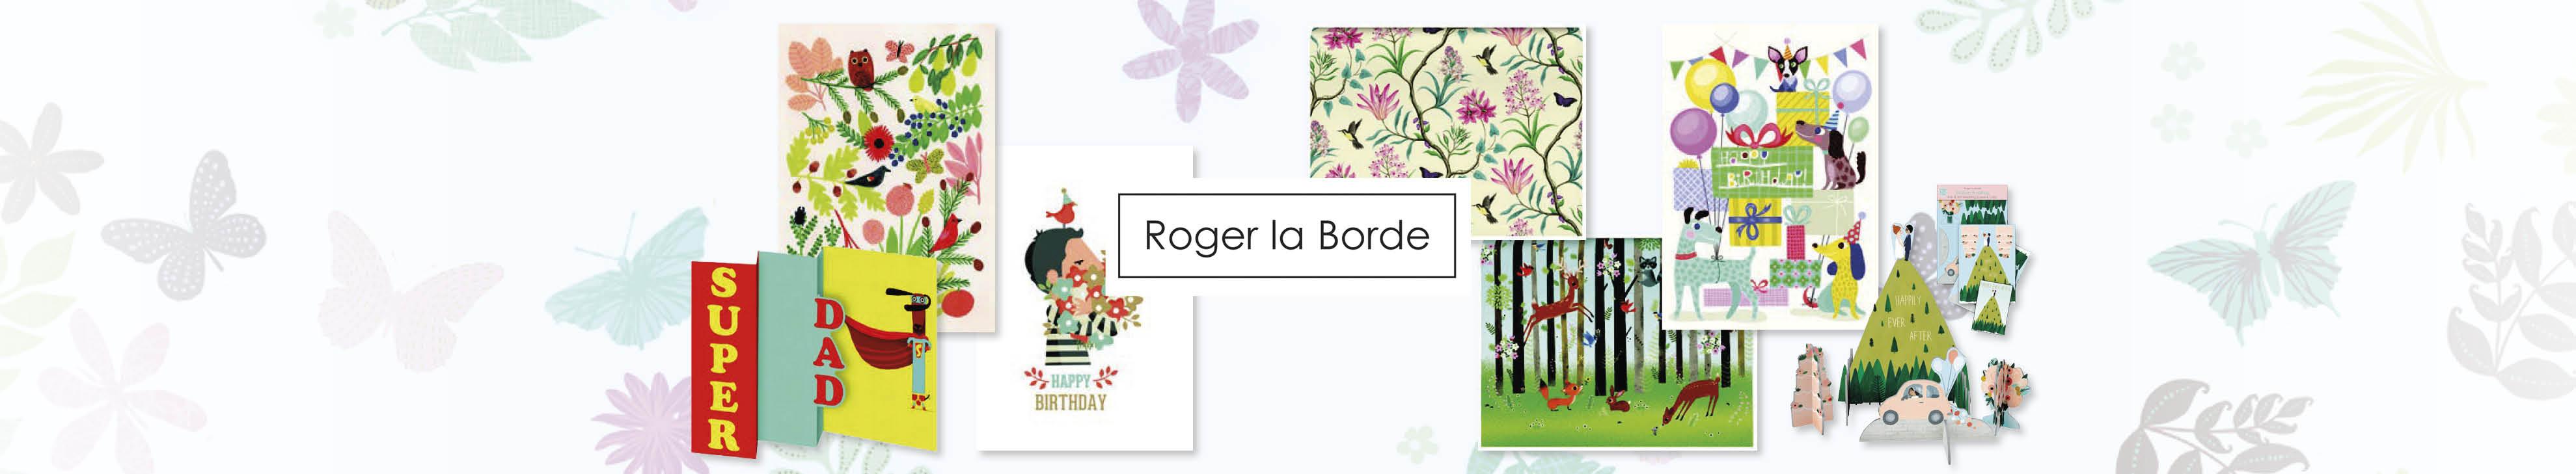 slider-rlb-kaarten